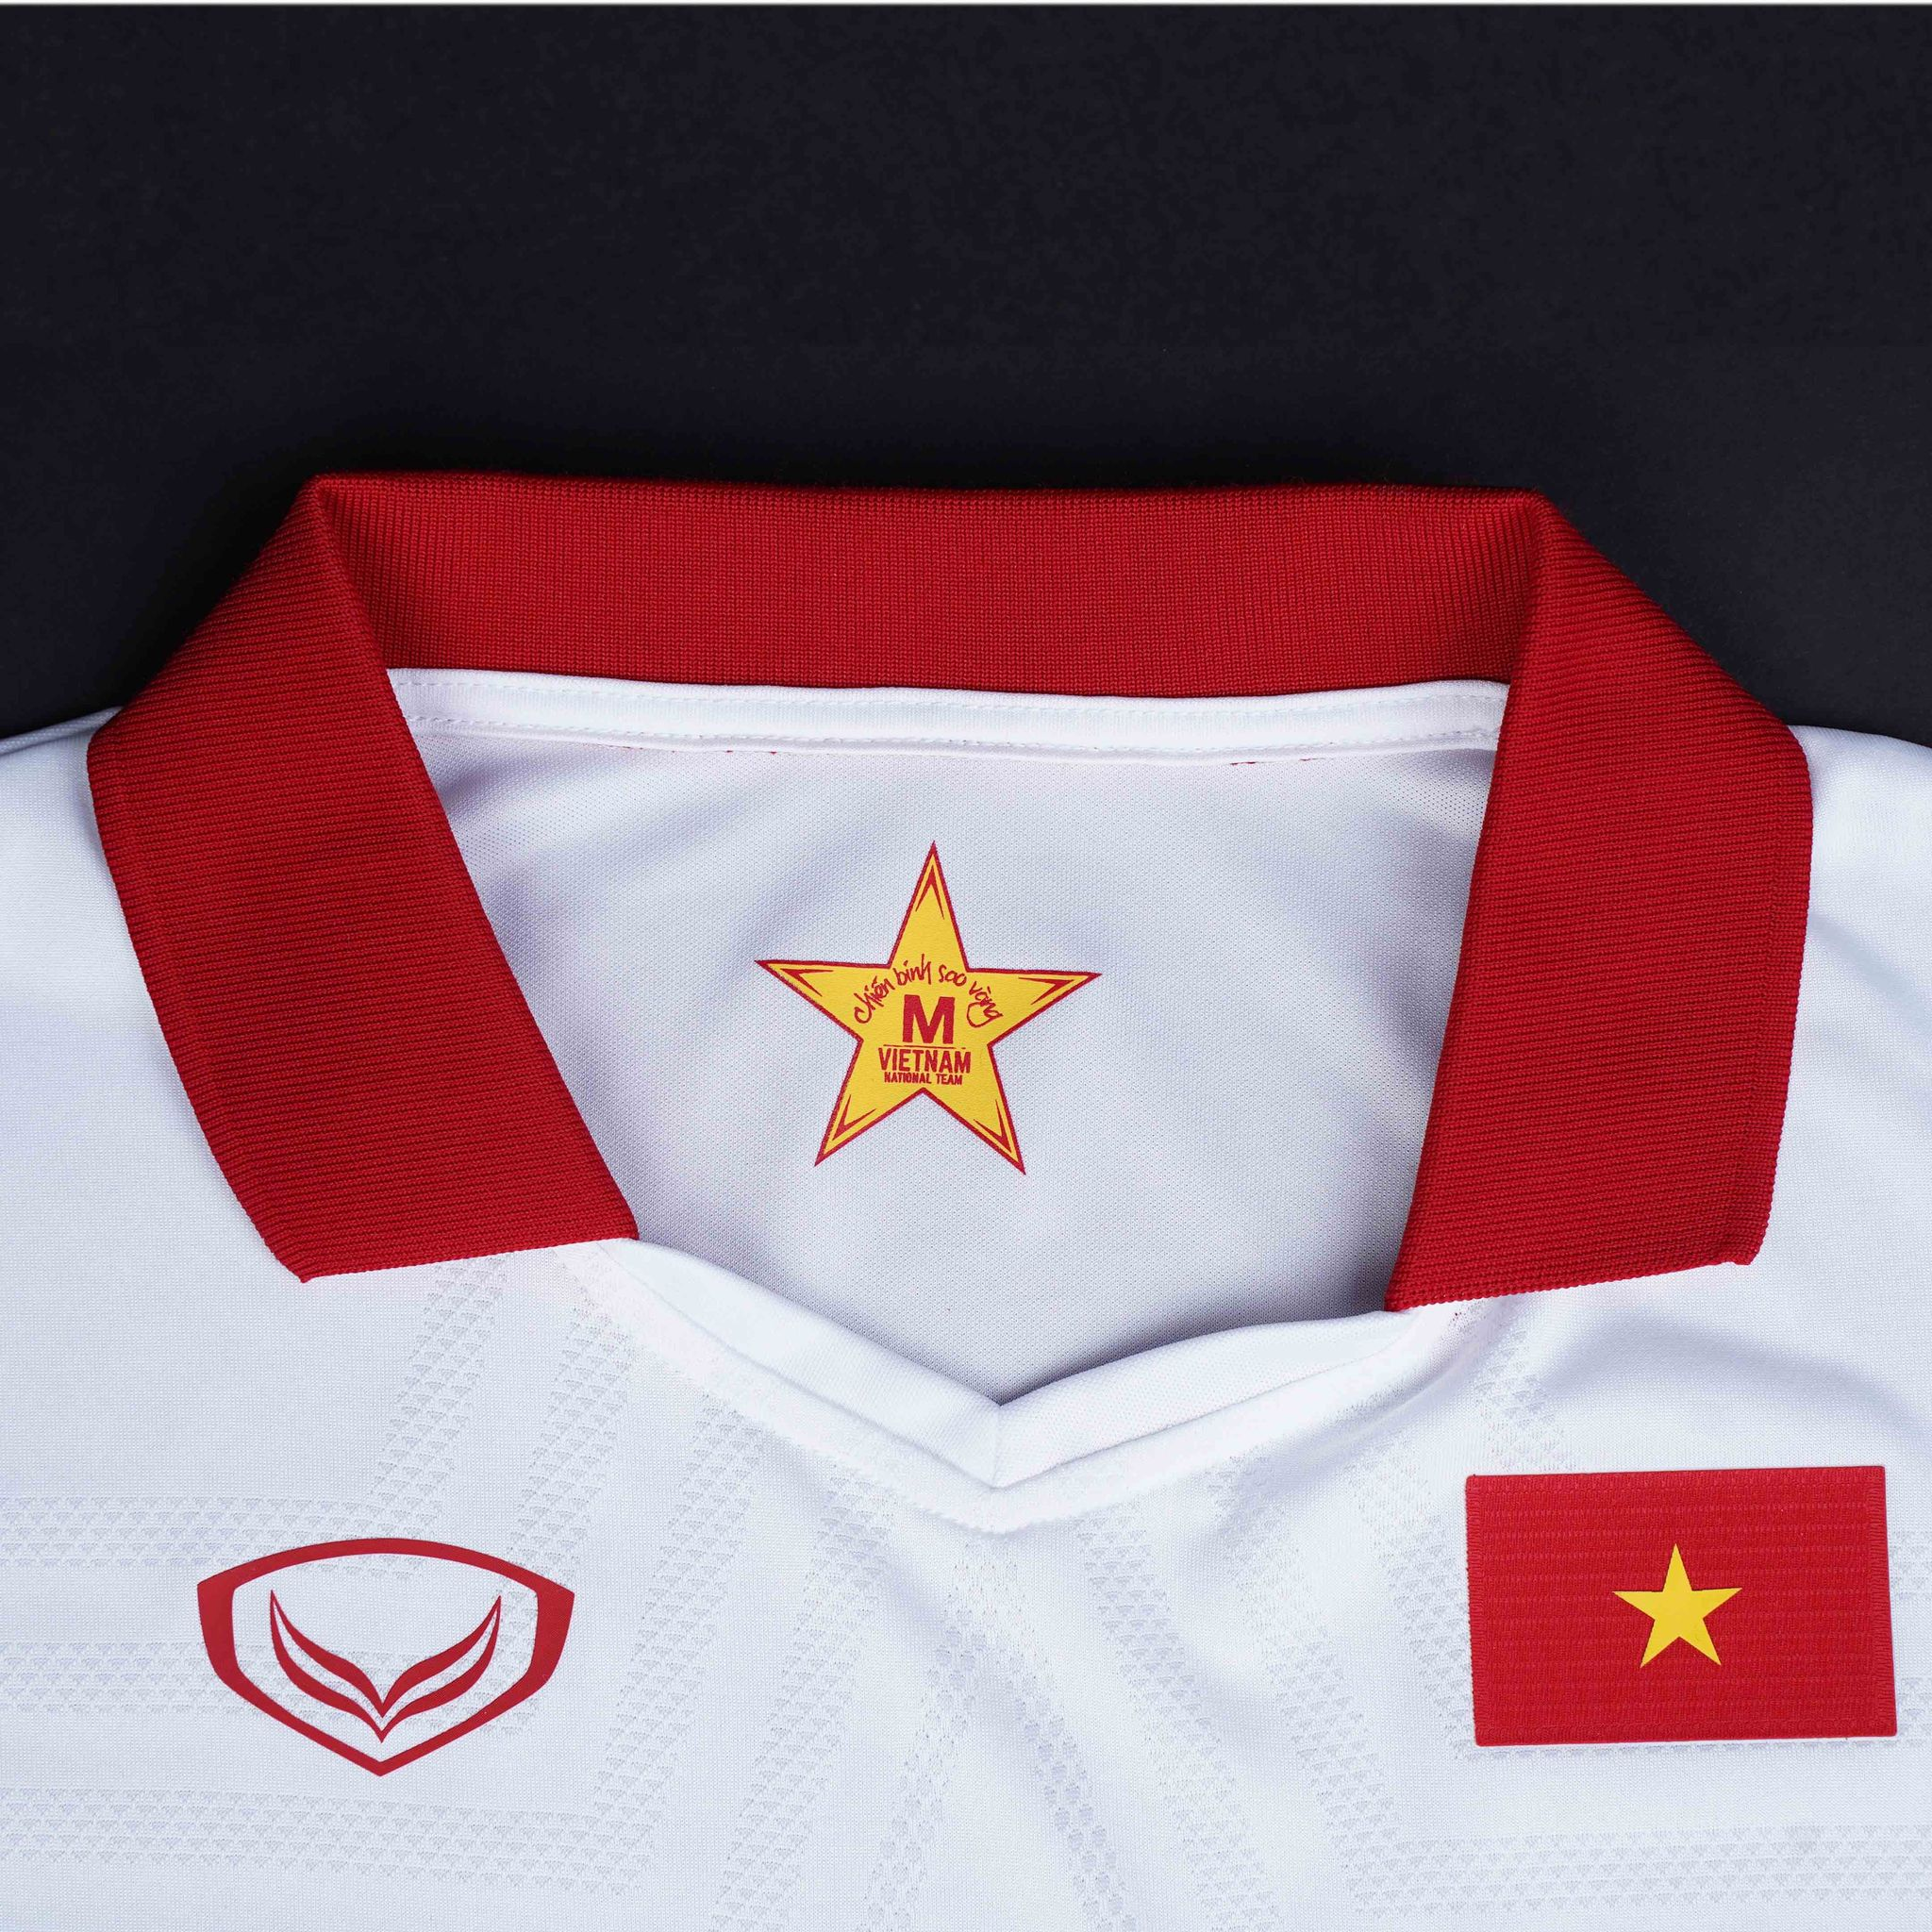 Vietnam 2021 Grand Sport Home and Away Shirts | 20/21 Kits ...